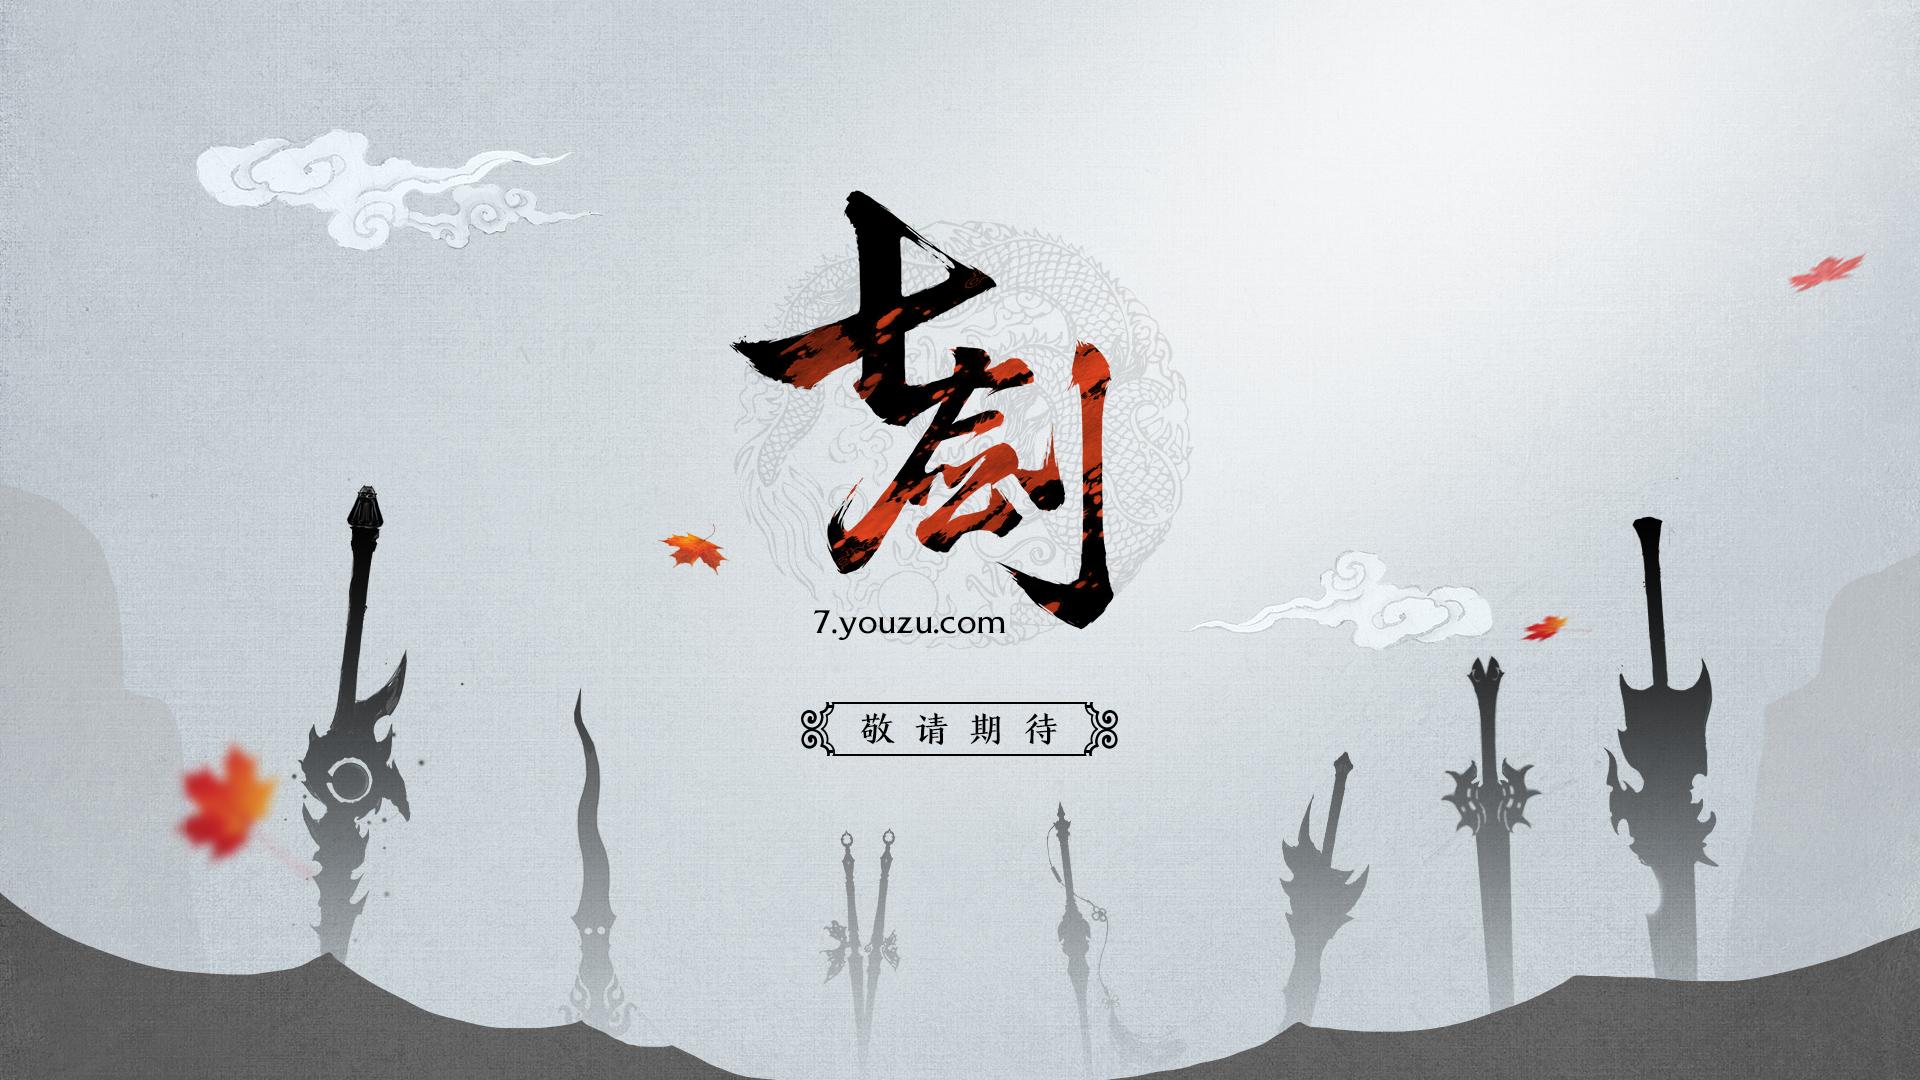 Seven Swords-Coming soon by onejian